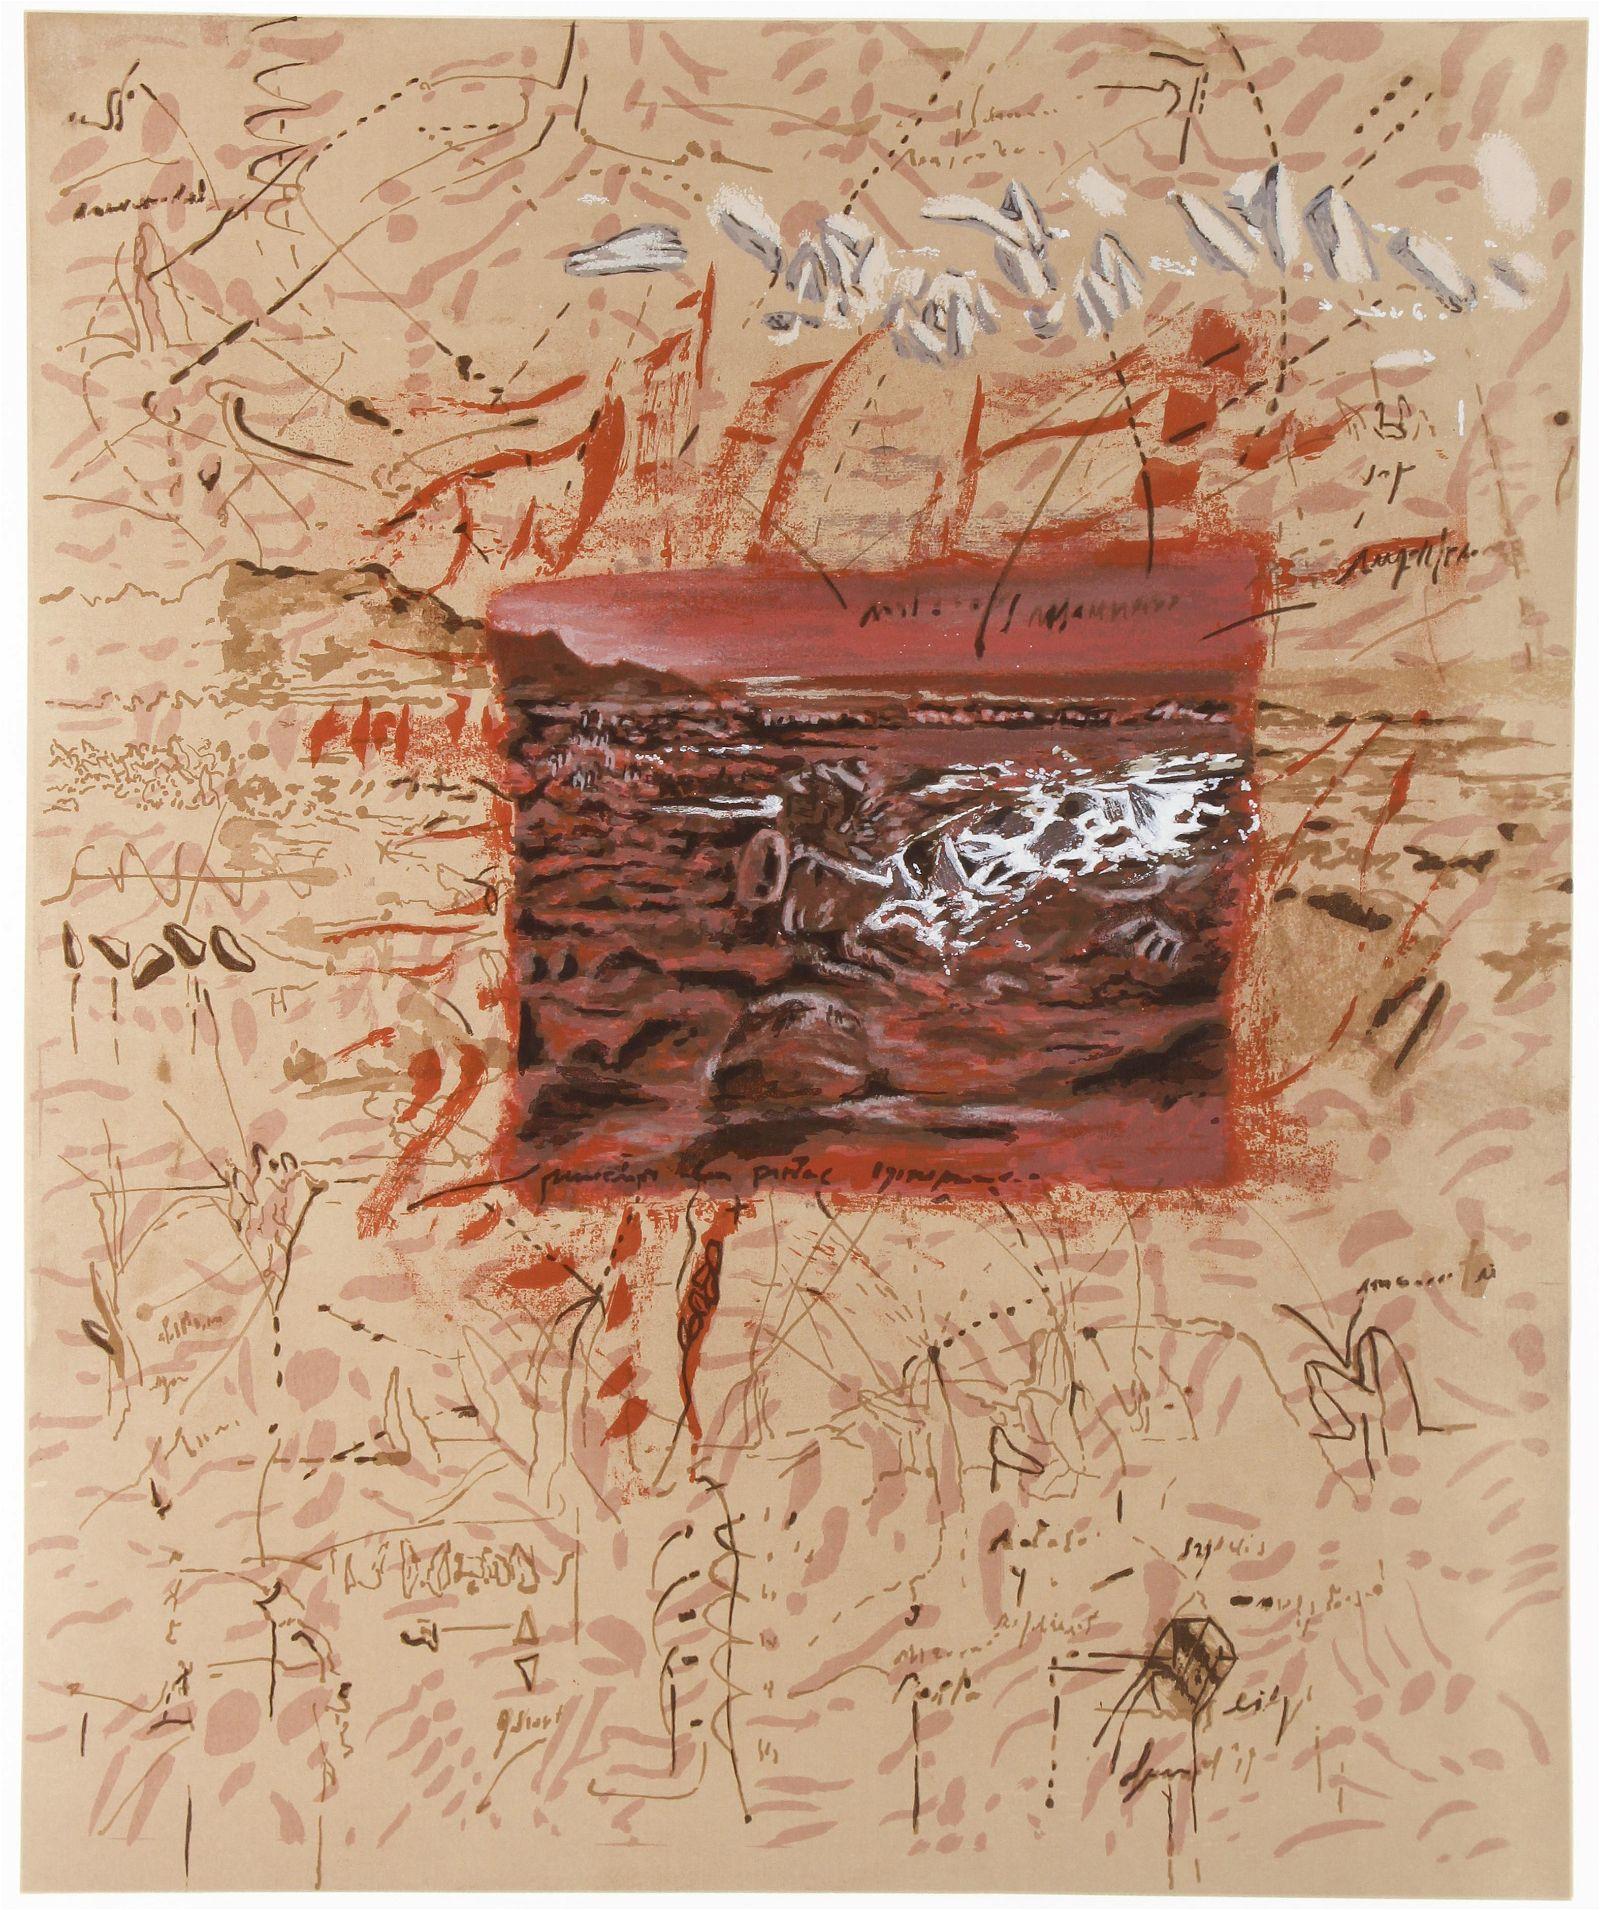 Jorge Tacla 1992 serigraph Representation and Notes